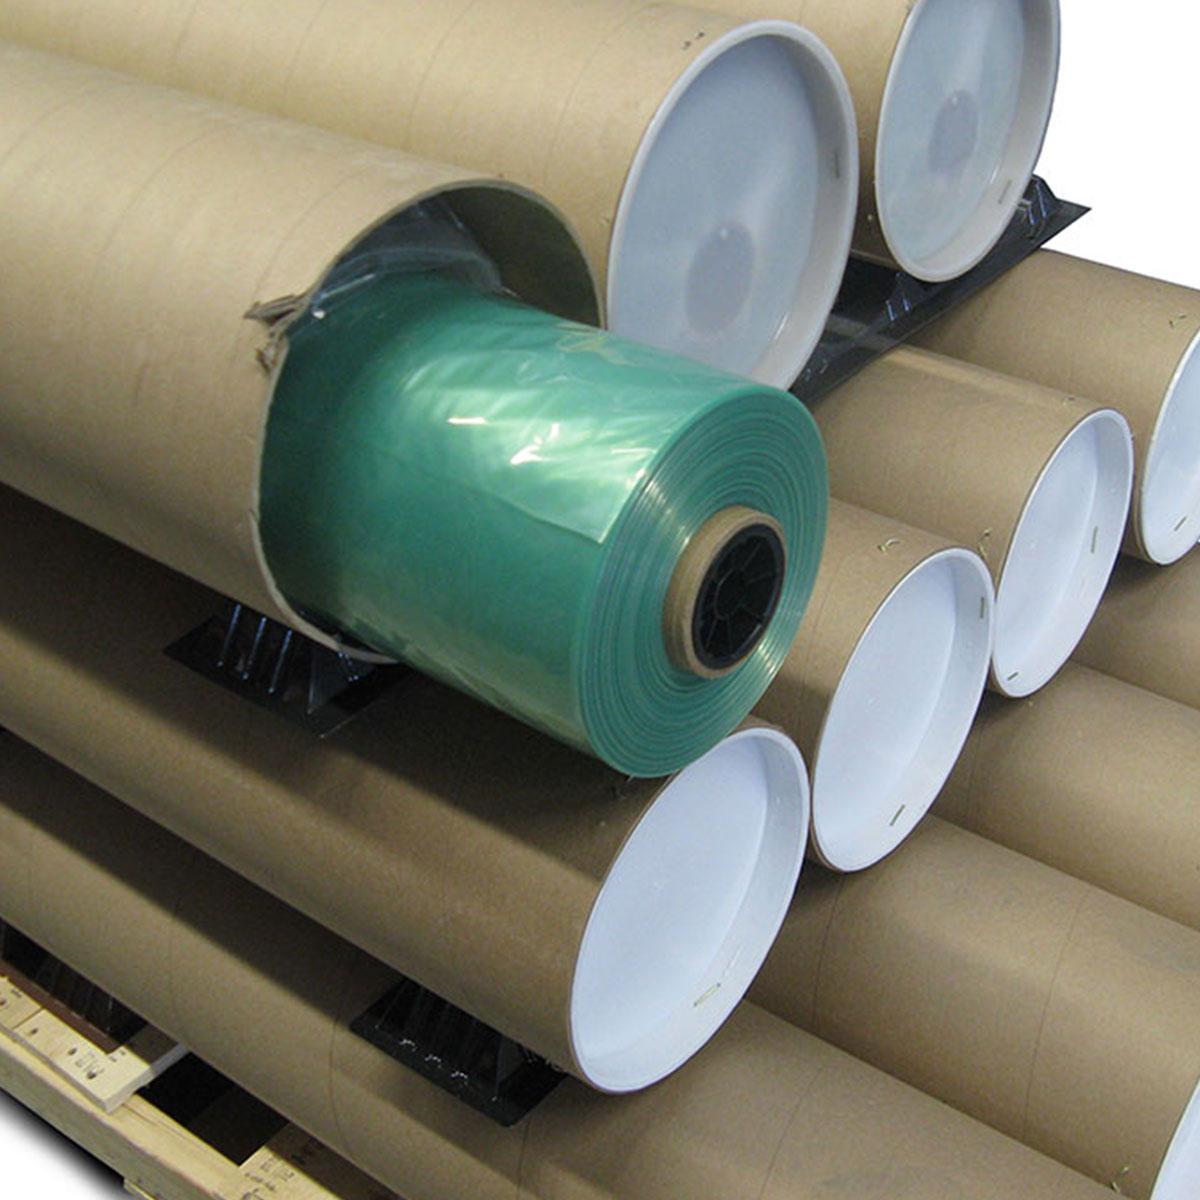 vakuum sack nylon 910 grn lft 0076mm x 910mm 4004m 0003 x 36